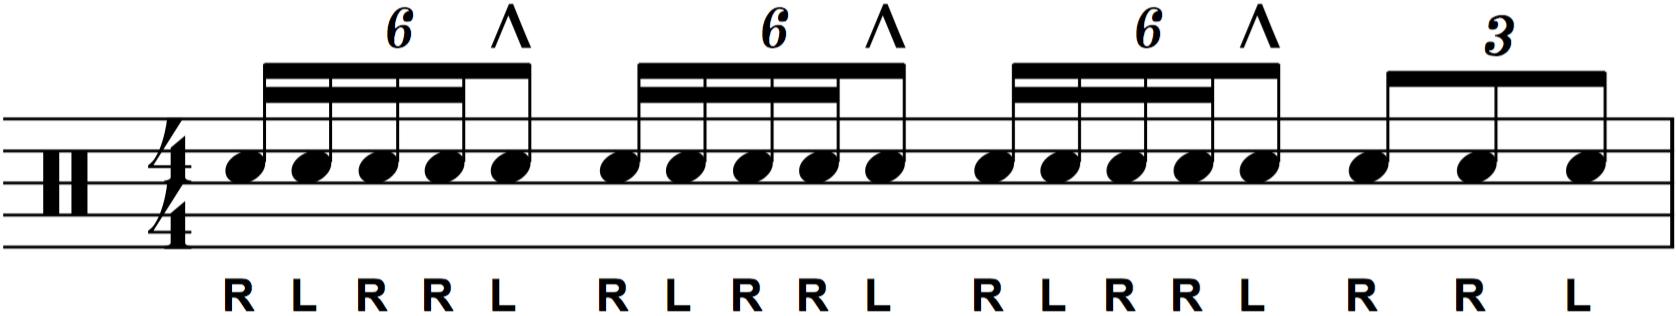 paradiddle-5-stroke-practice-pattern